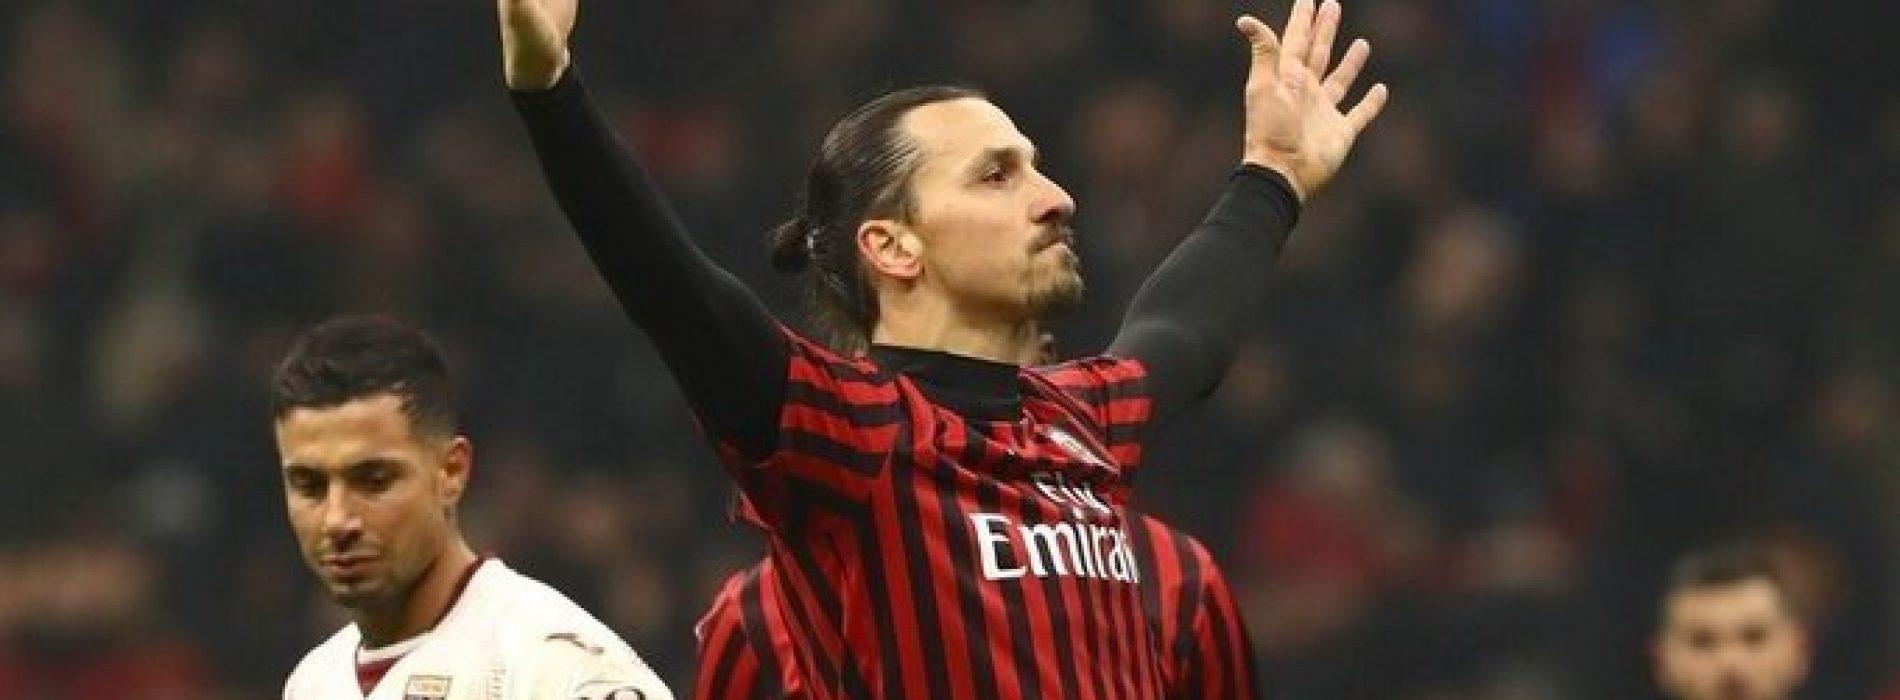 Milan rinnovo Ibrahimovic: ecco l'offerta dei rossoneri